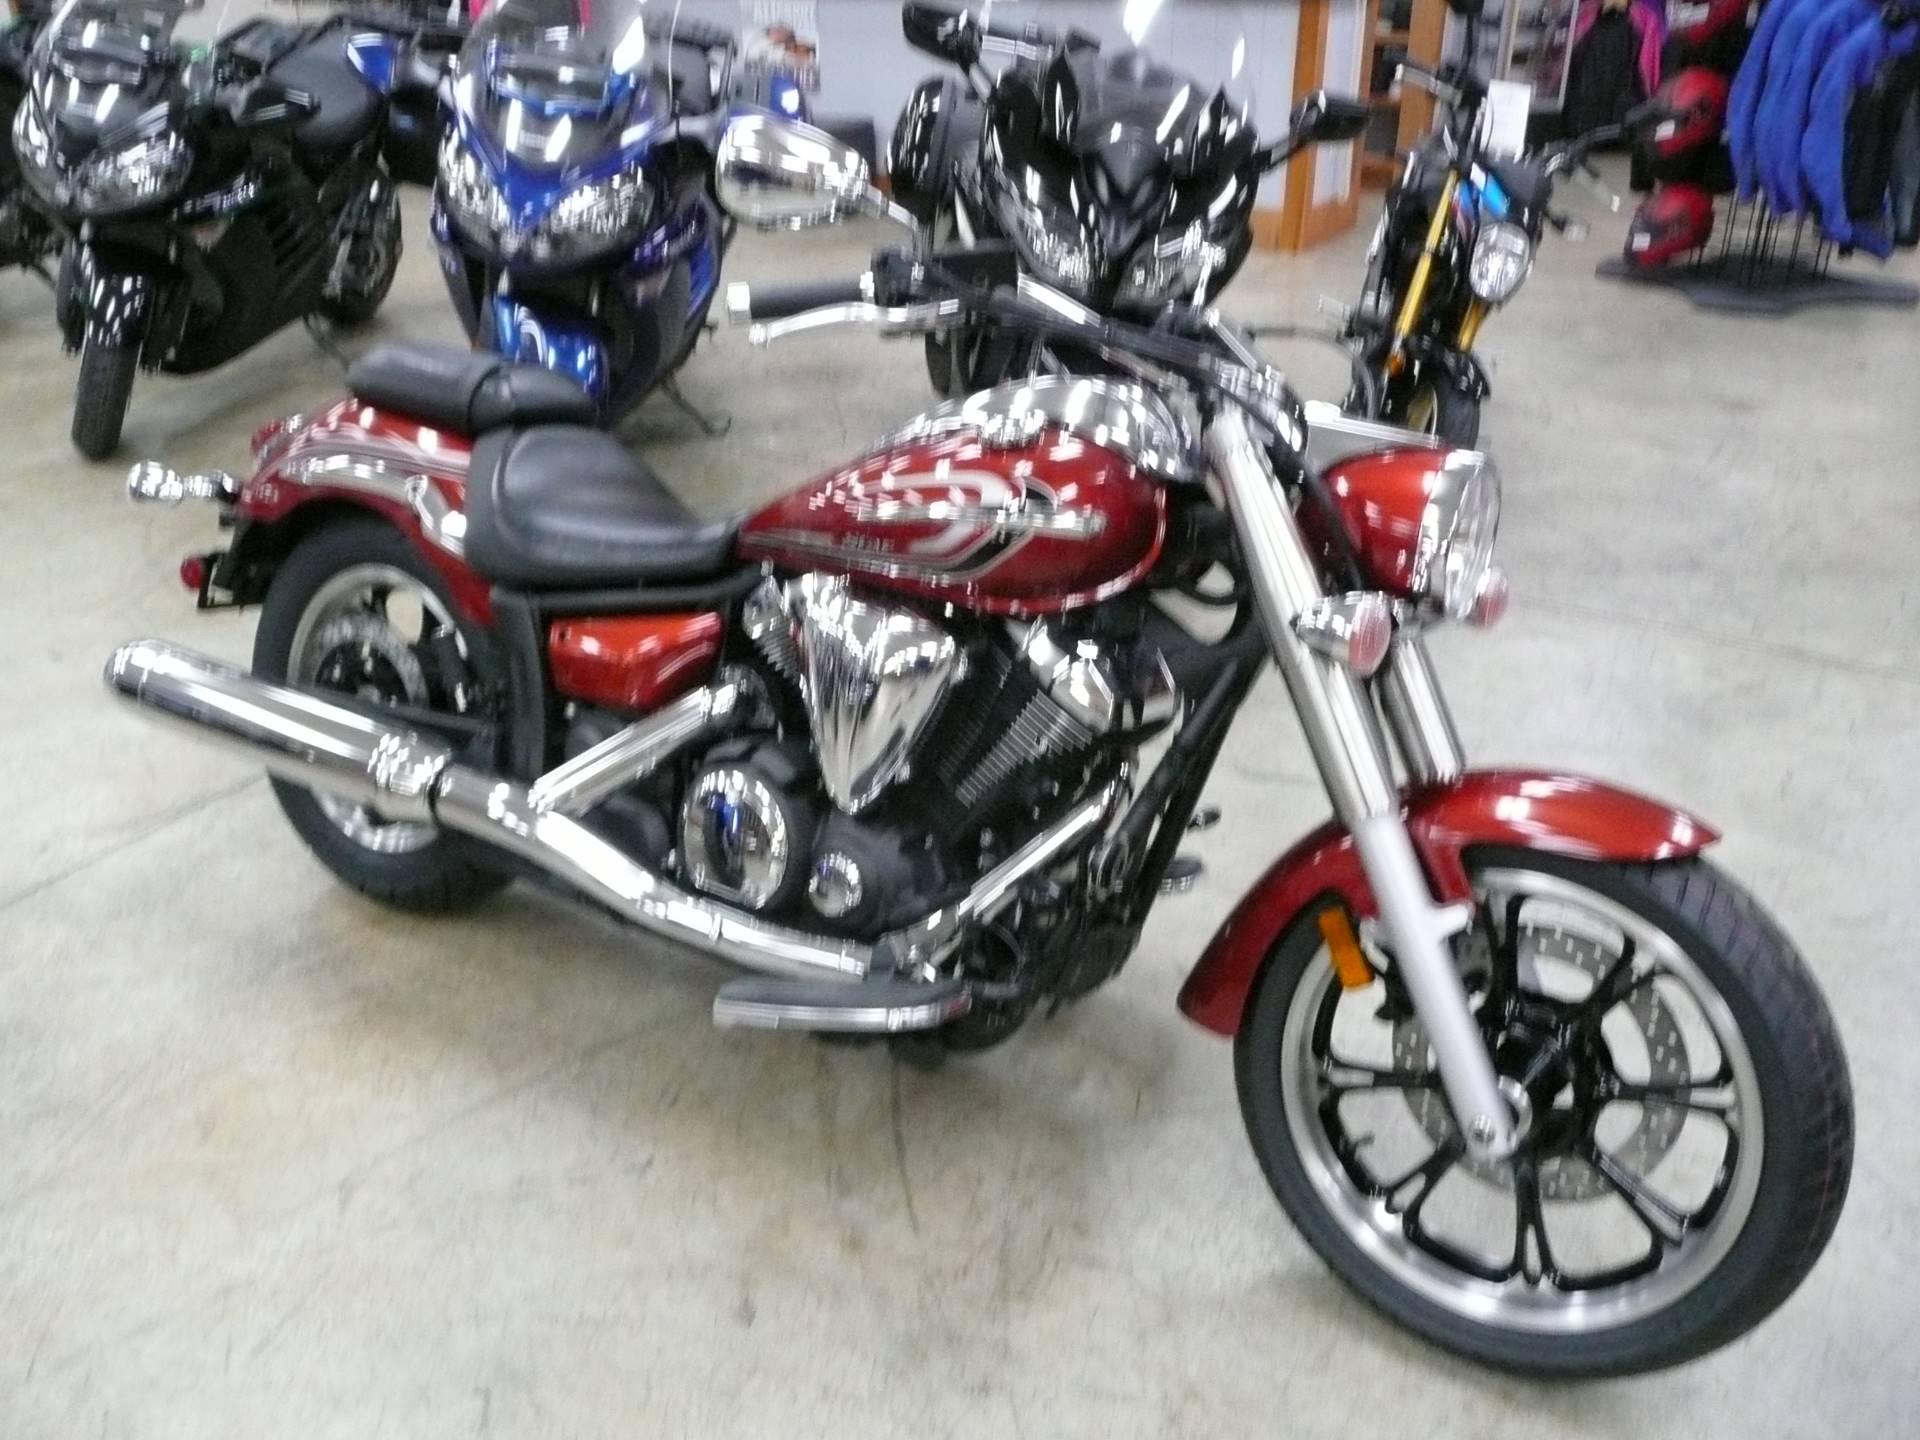 2015 yamaha v star 950 motorcycles unionville virginia. Black Bedroom Furniture Sets. Home Design Ideas